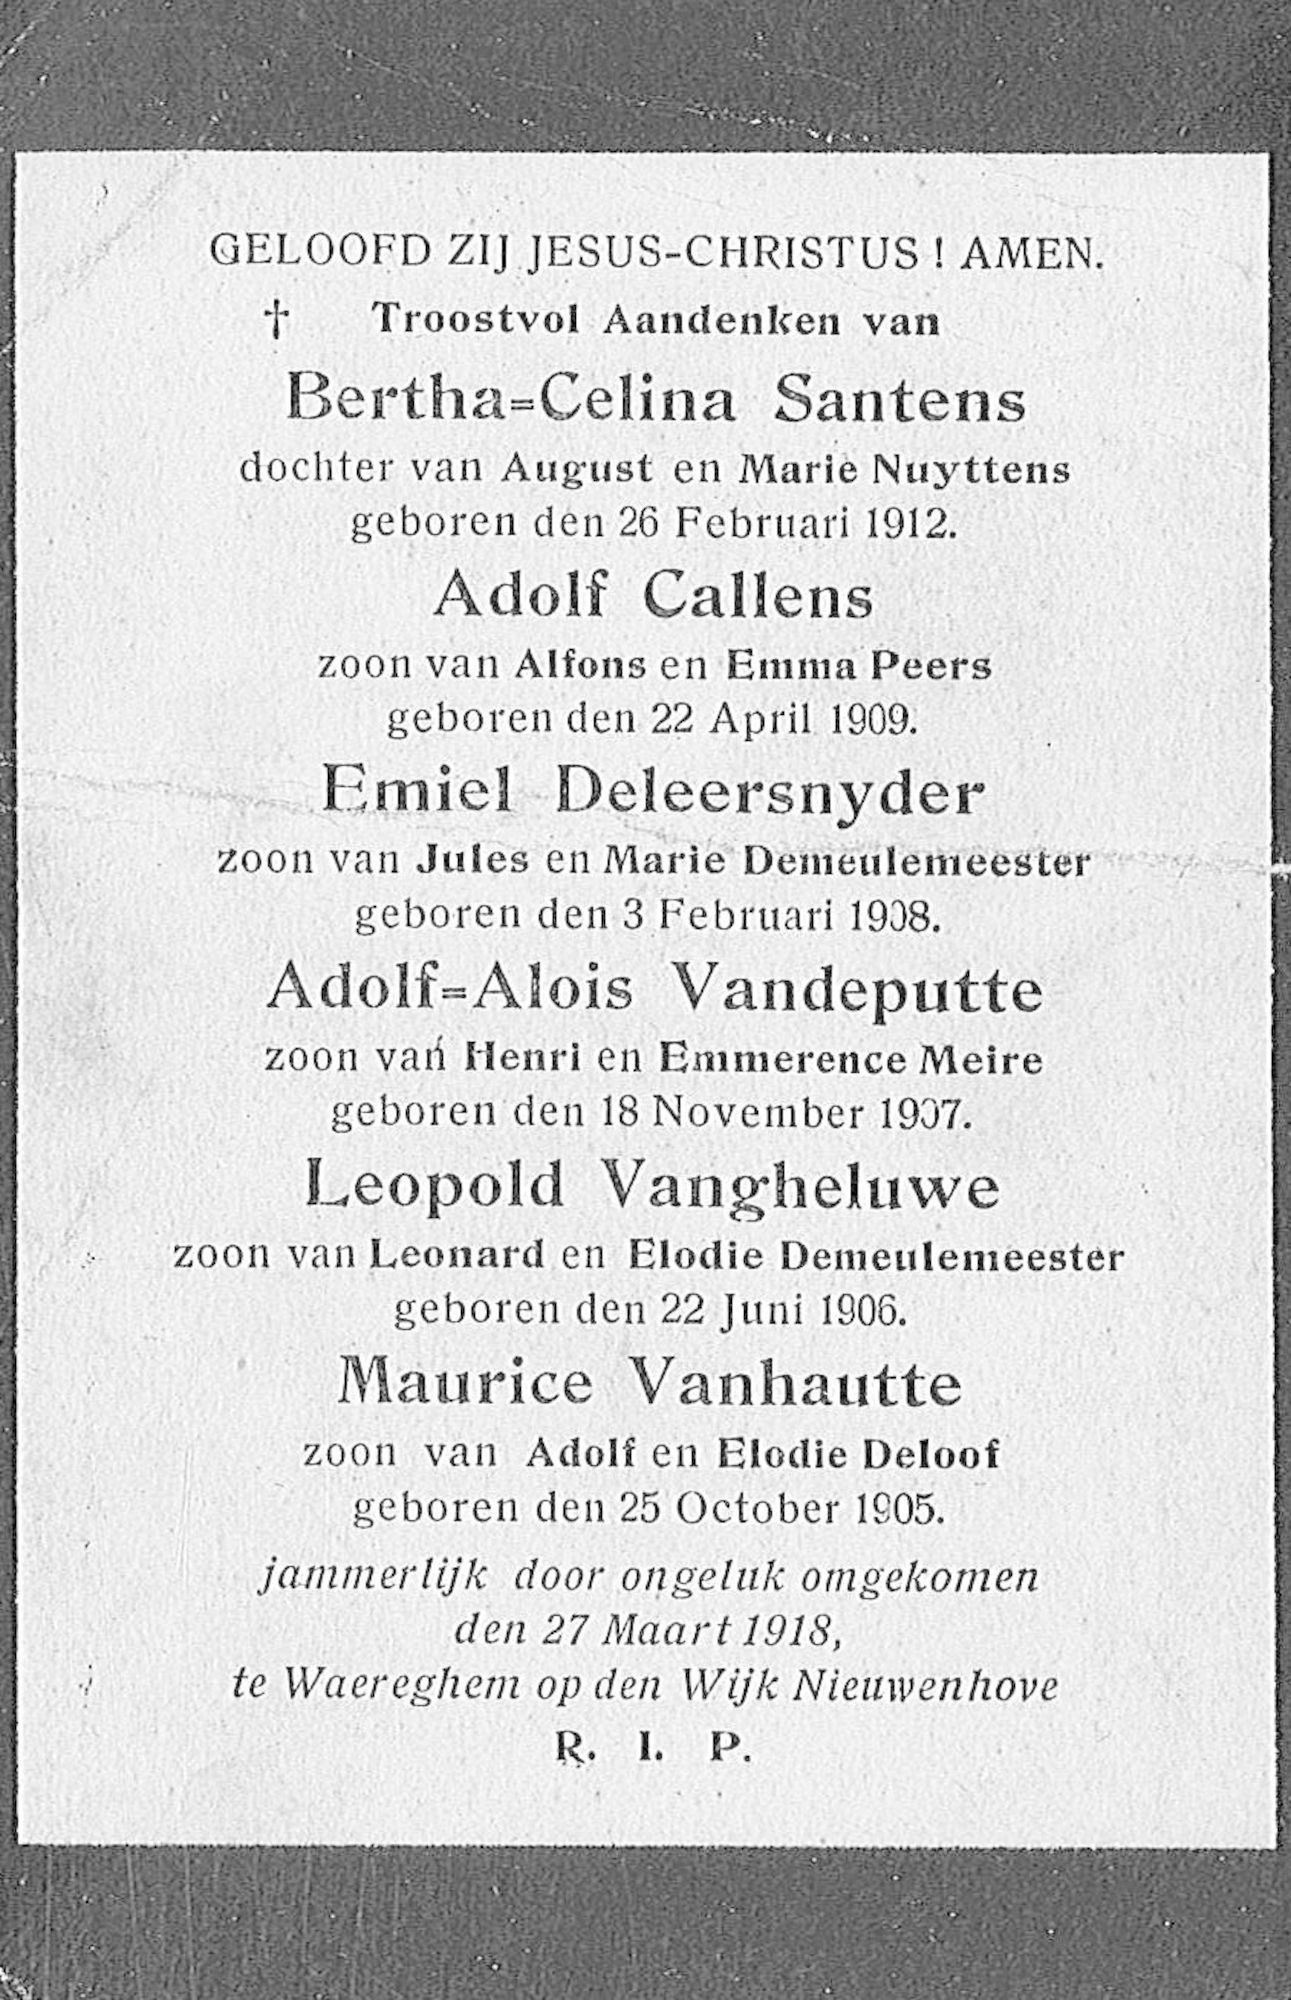 Bertha-Celina Santens, Adolf Callens, Emiel Deleersnyder, Adolf-Alois Vandeputte, Leopold Vangheluwe, Maurice Vanhautte